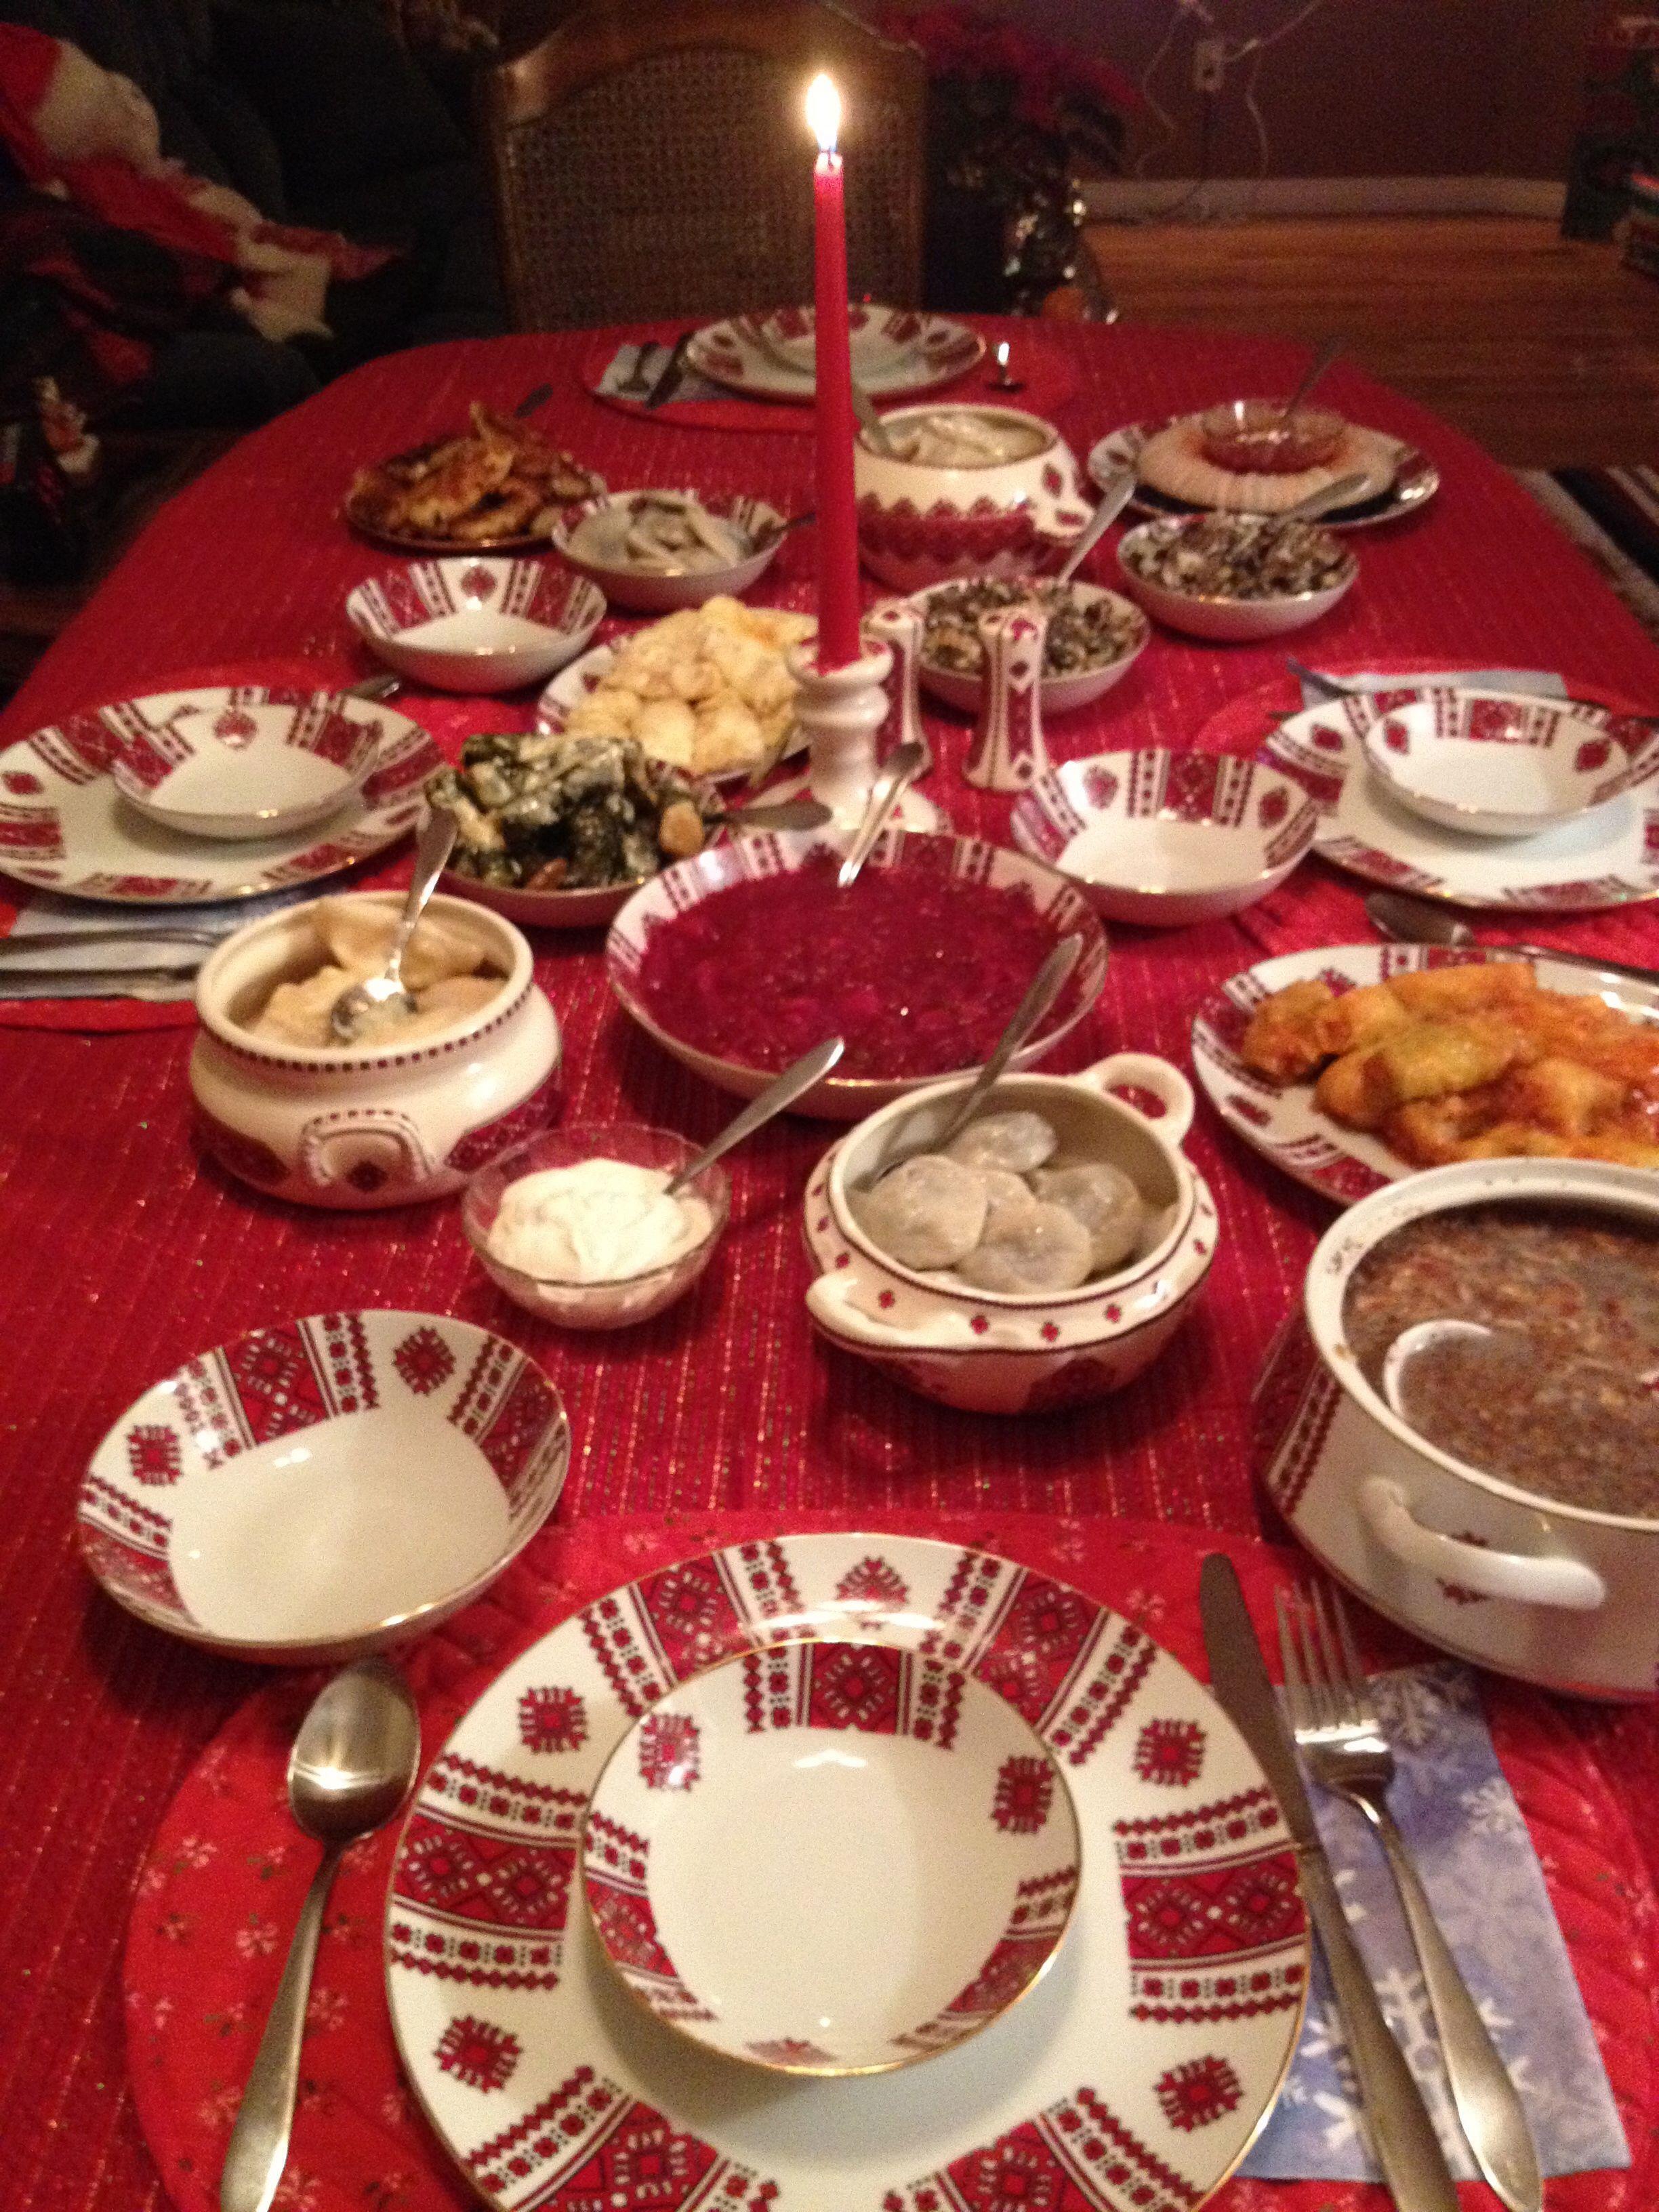 12 Ukrainian Dishes for Christmas Eve Recipes (Plus bonus